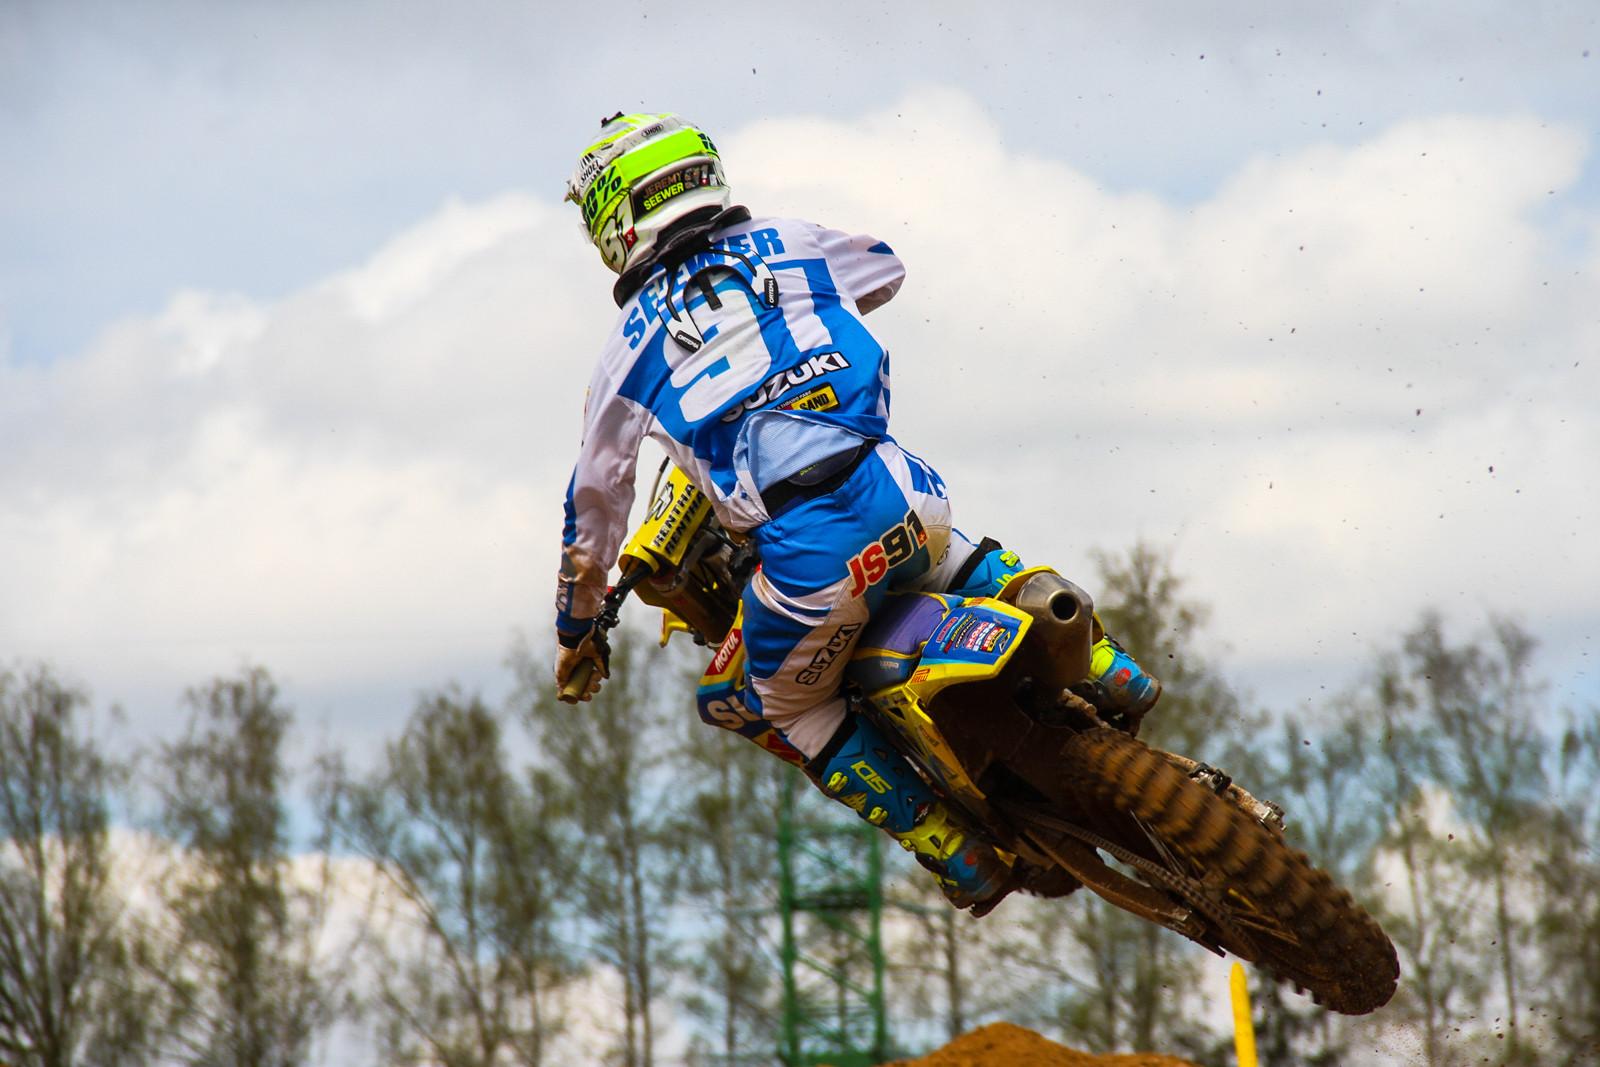 Jeremy Seewer - Photo Blast: 2017 MXGP of Latvia - Motocross Pictures - Vital MX